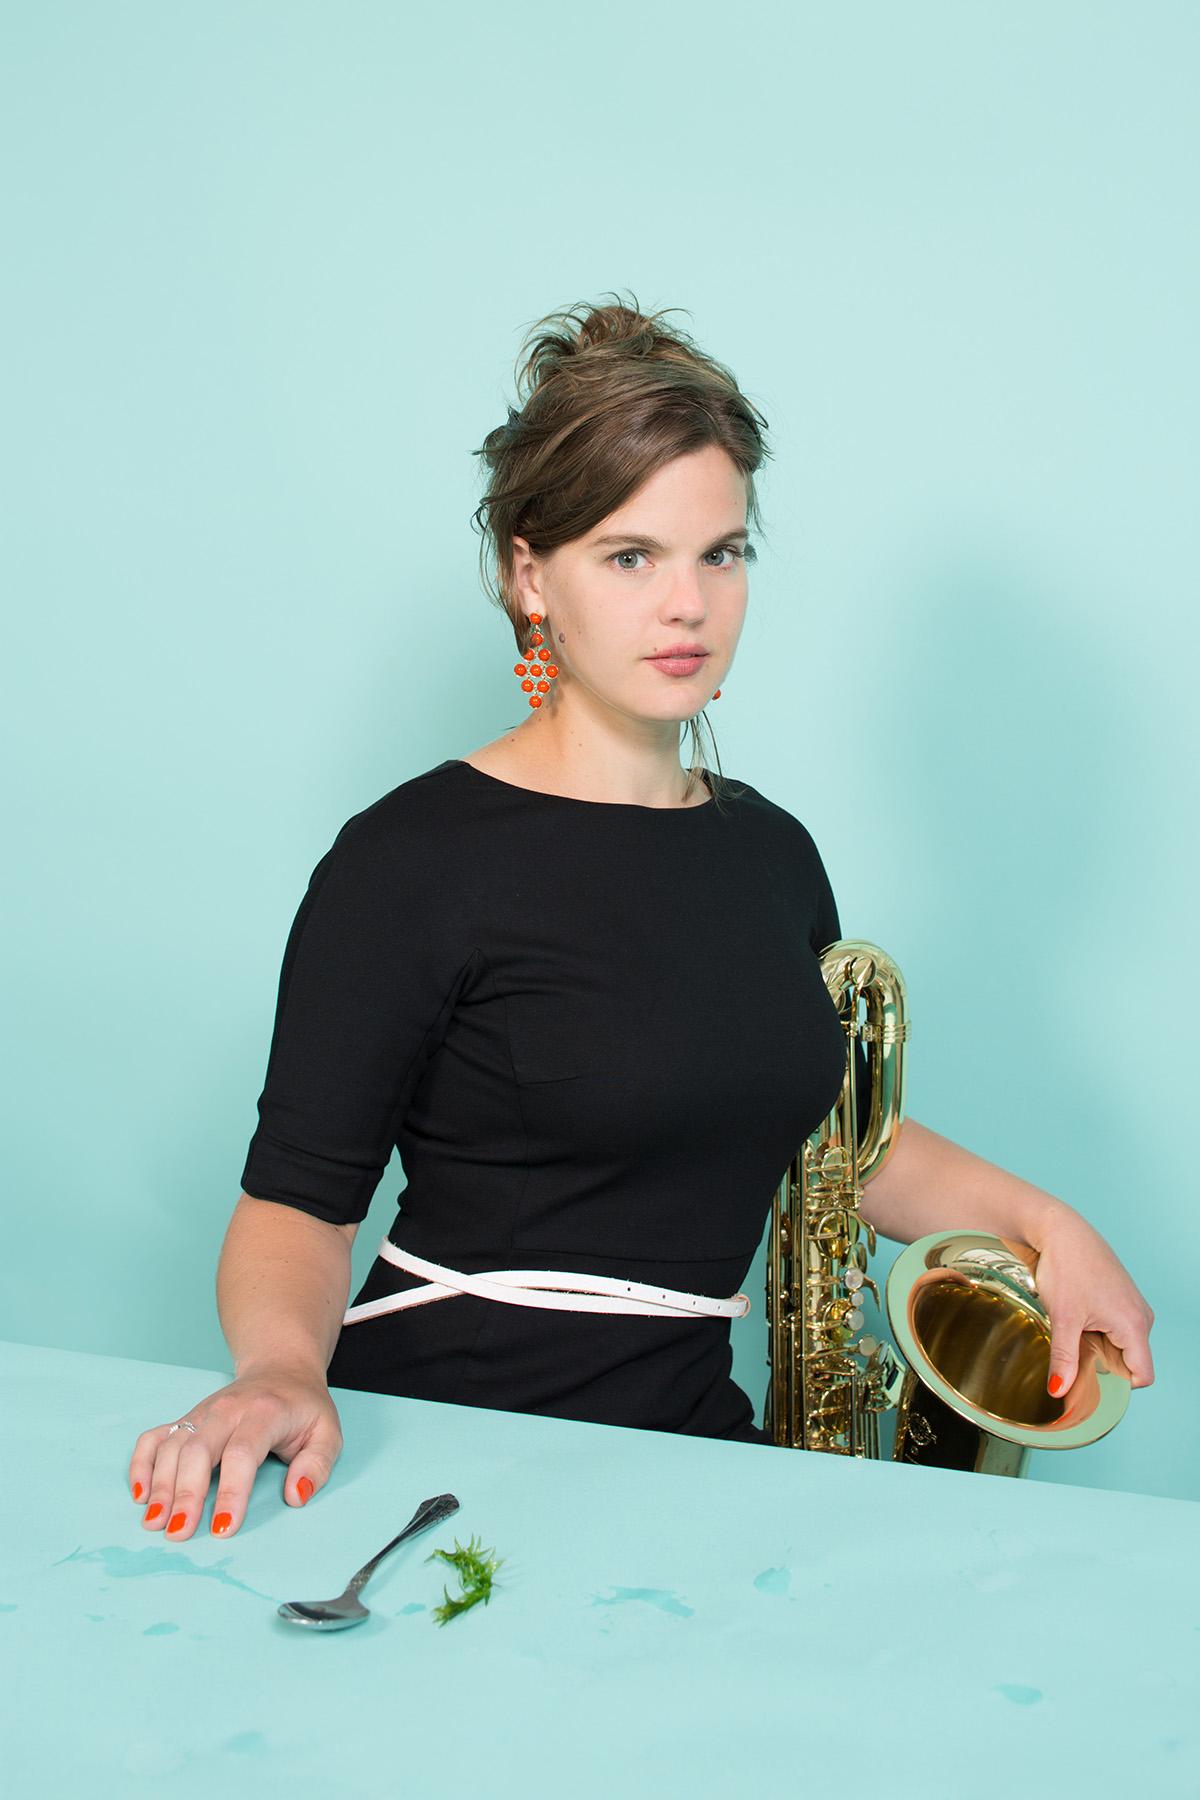 Syrène Saxofoonkwartet, foto door Heidi de Gier